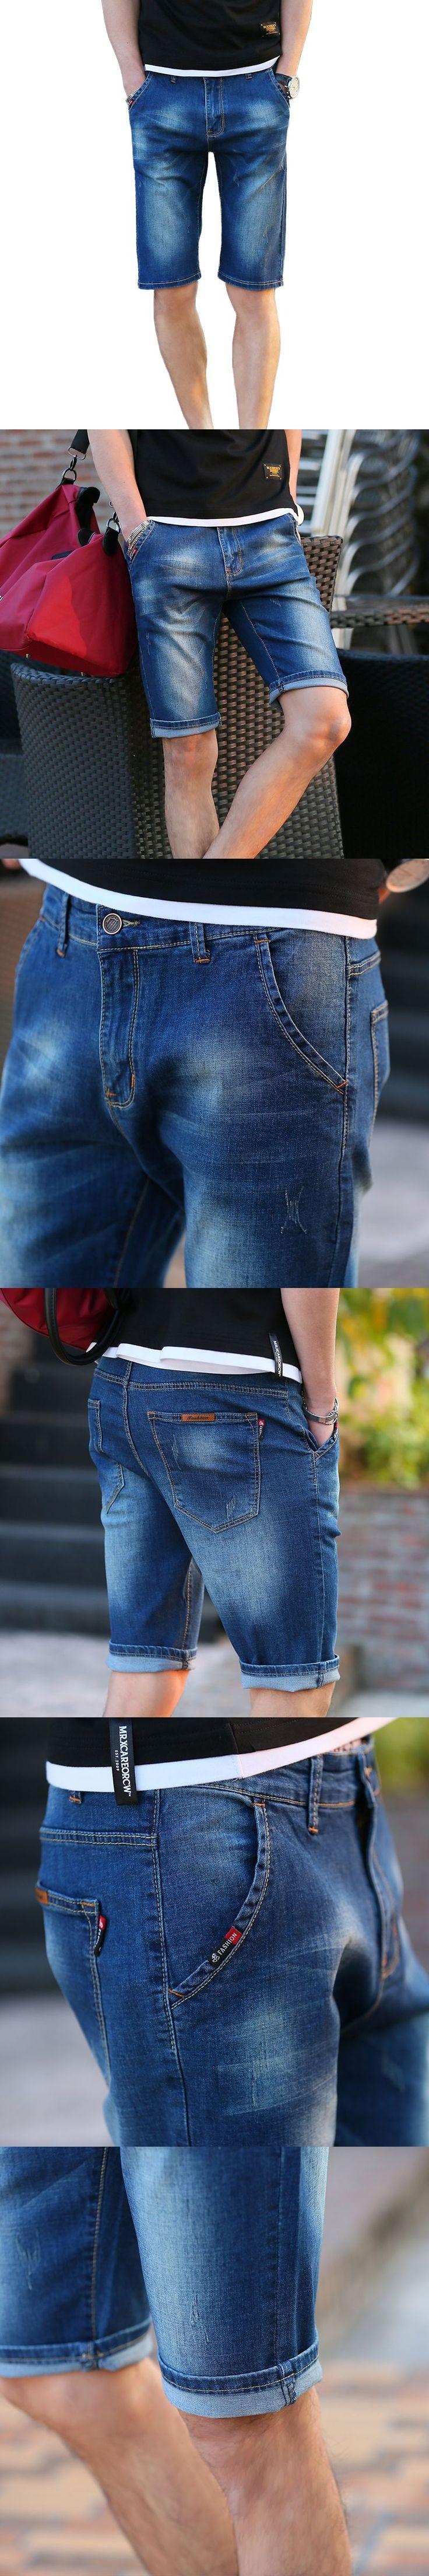 Brand Mens Lightweight Stretch Denim Jean Shorts Blue Short Plus Size Jeans for Men Summer Mens Short Pants Trouser